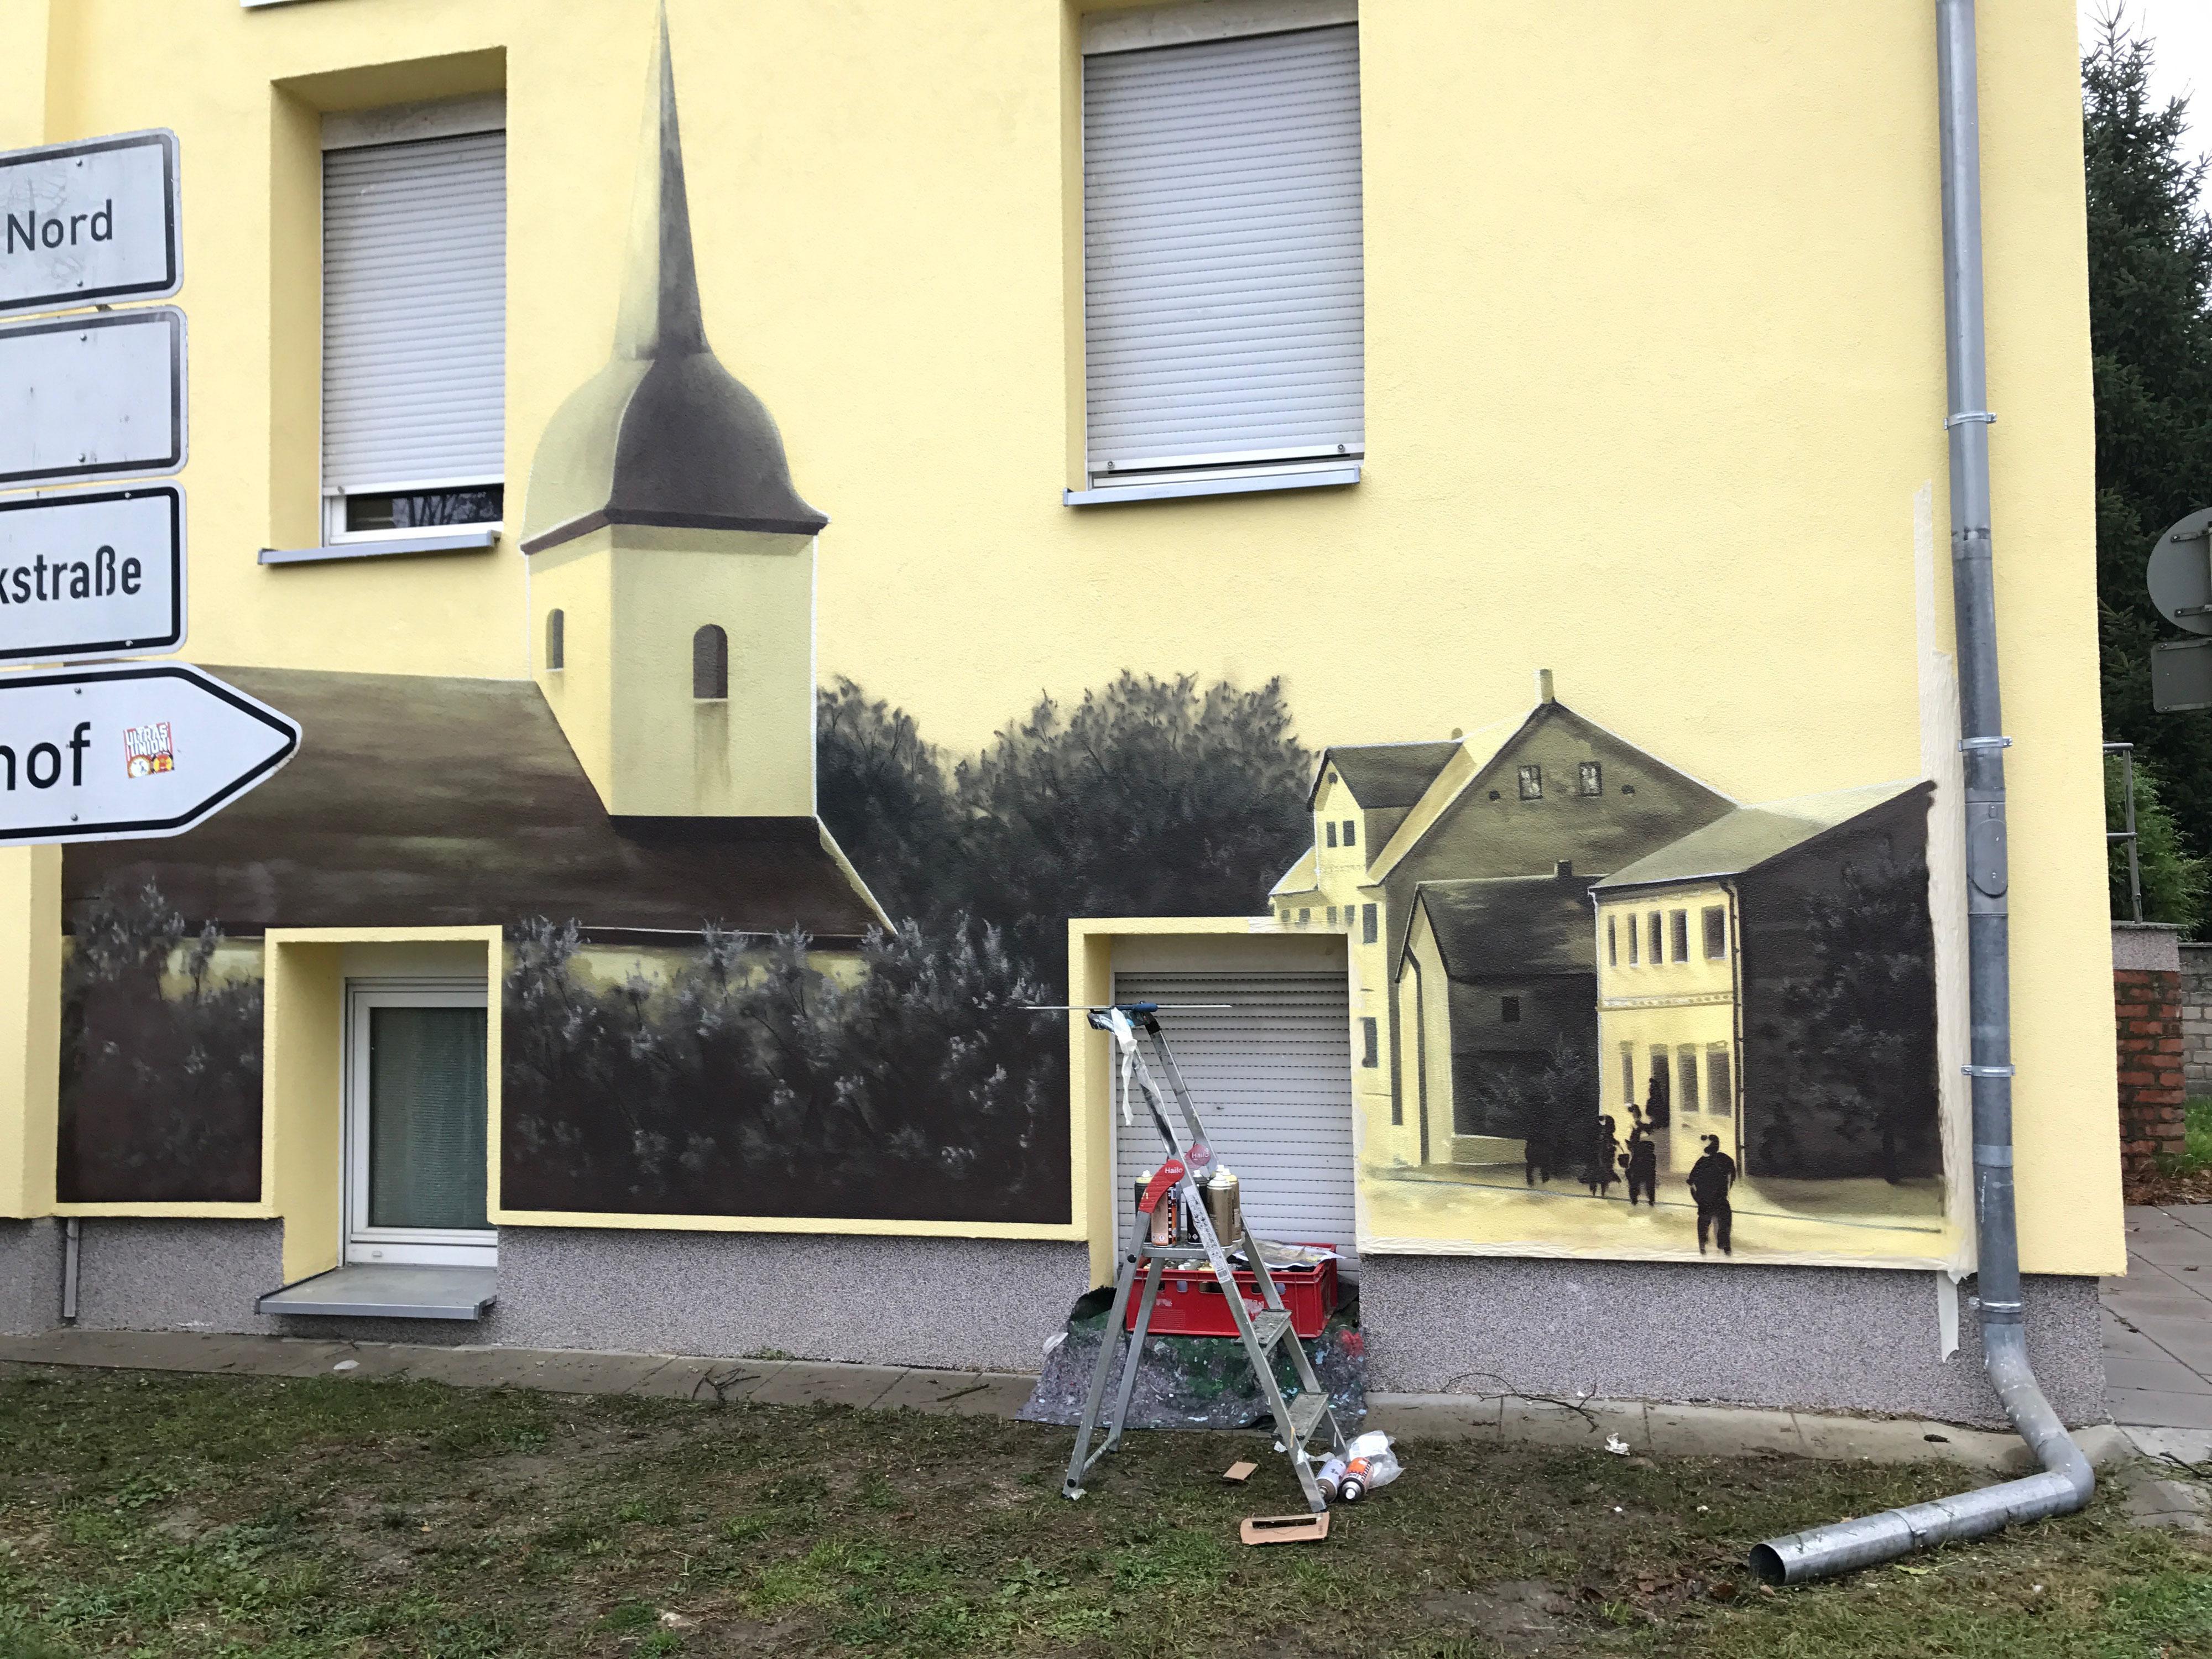 fassadengestaltung in fredersdorf bei berlin graffiti k nstler fassade. Black Bedroom Furniture Sets. Home Design Ideas